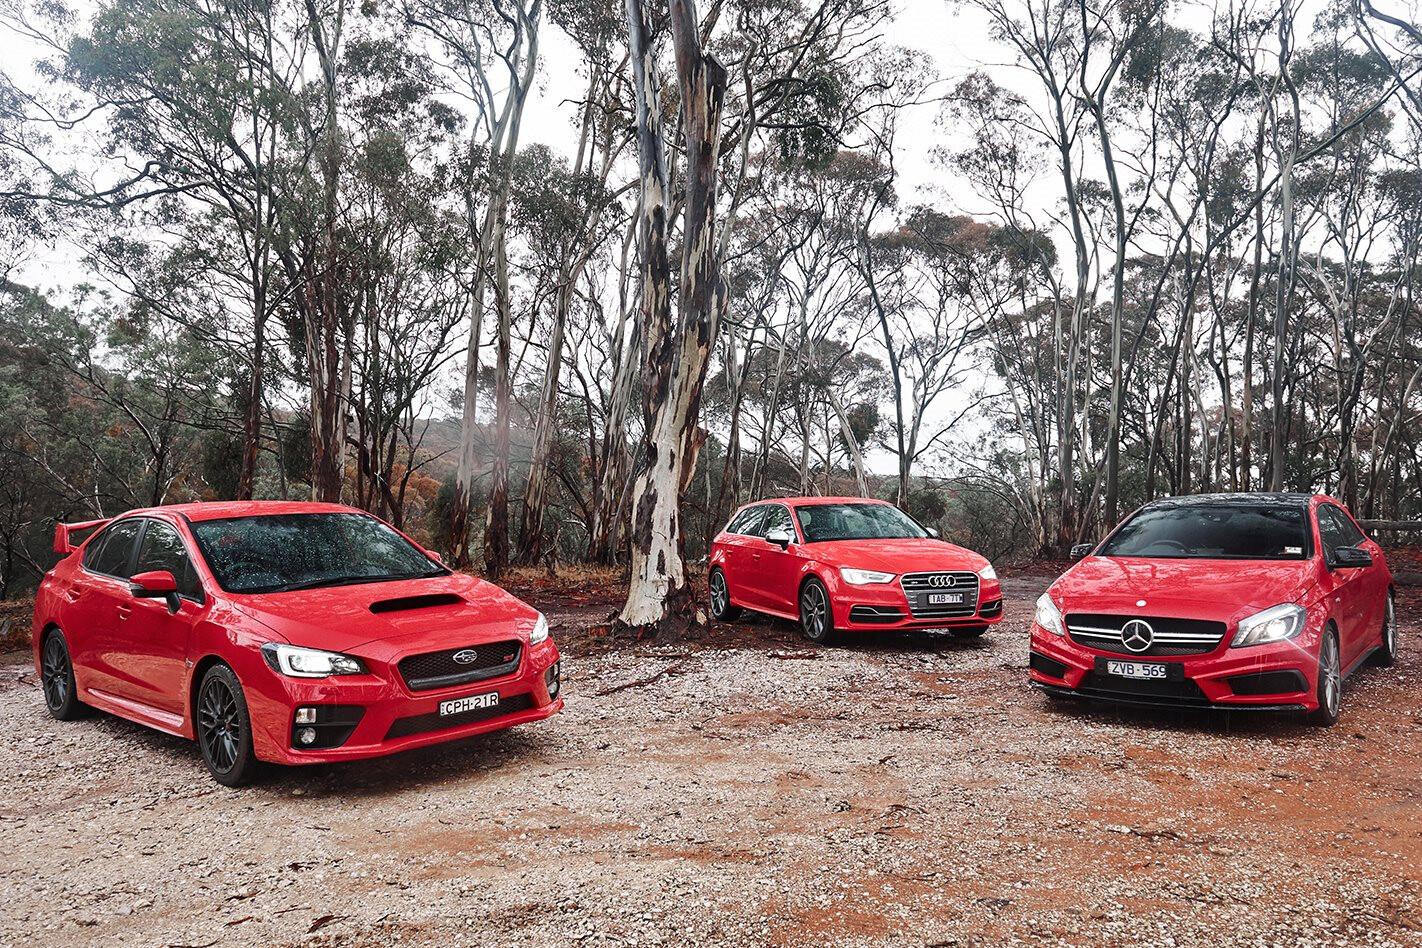 Subaru WRX STI vs Audi S3 vs Mercedes-Benz A45 AMG